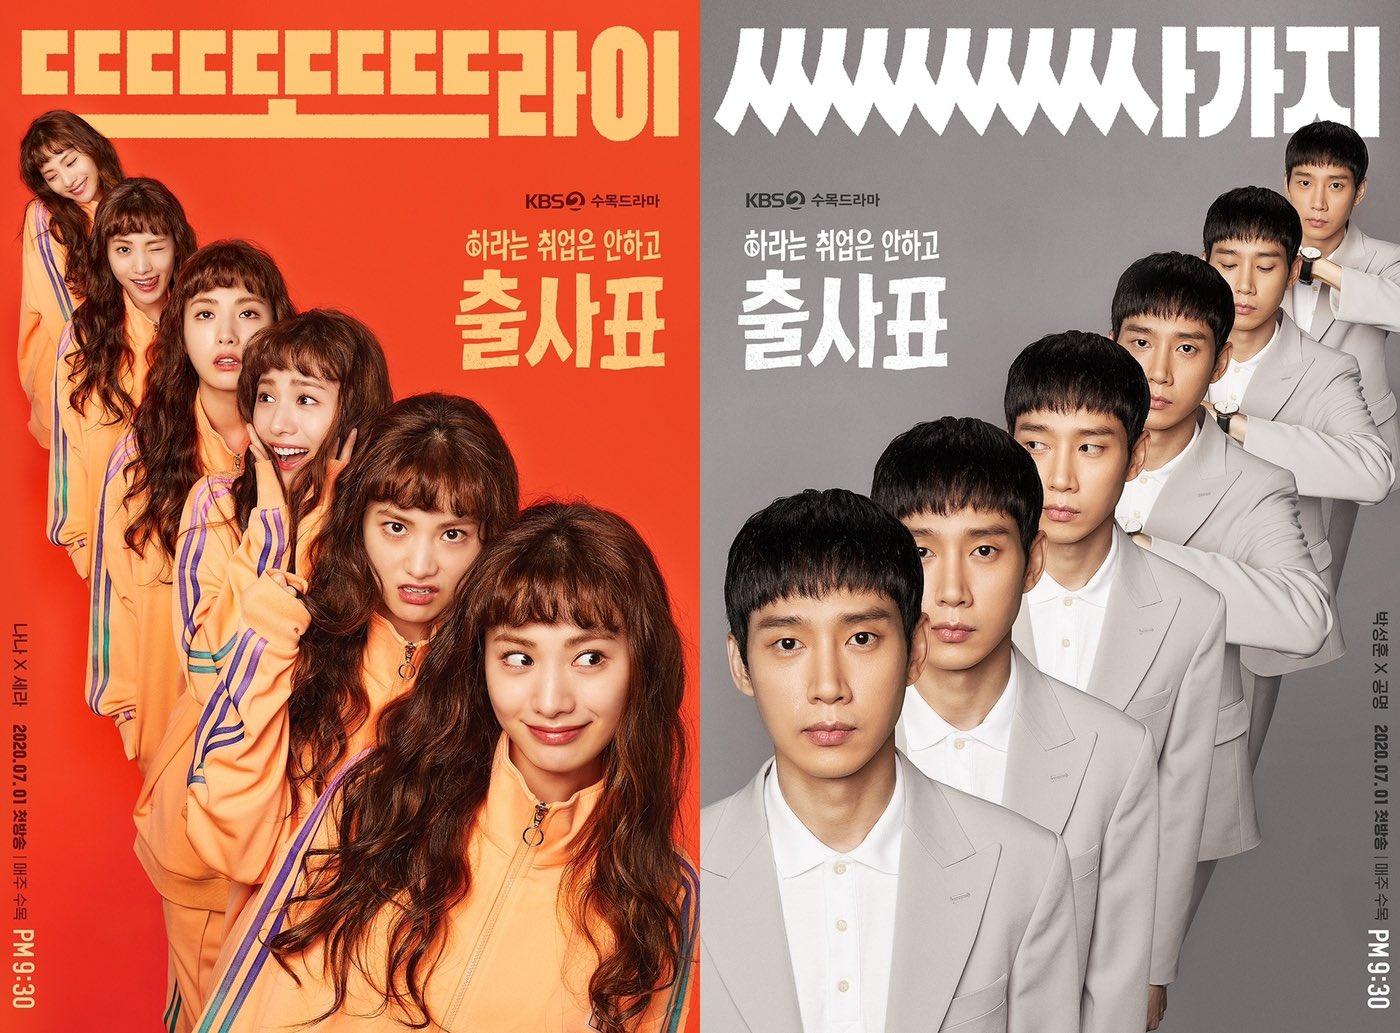 Into The Ring atau juga disebut Memorials merupakan drama Korea yang dirilis pada Juli 2020.